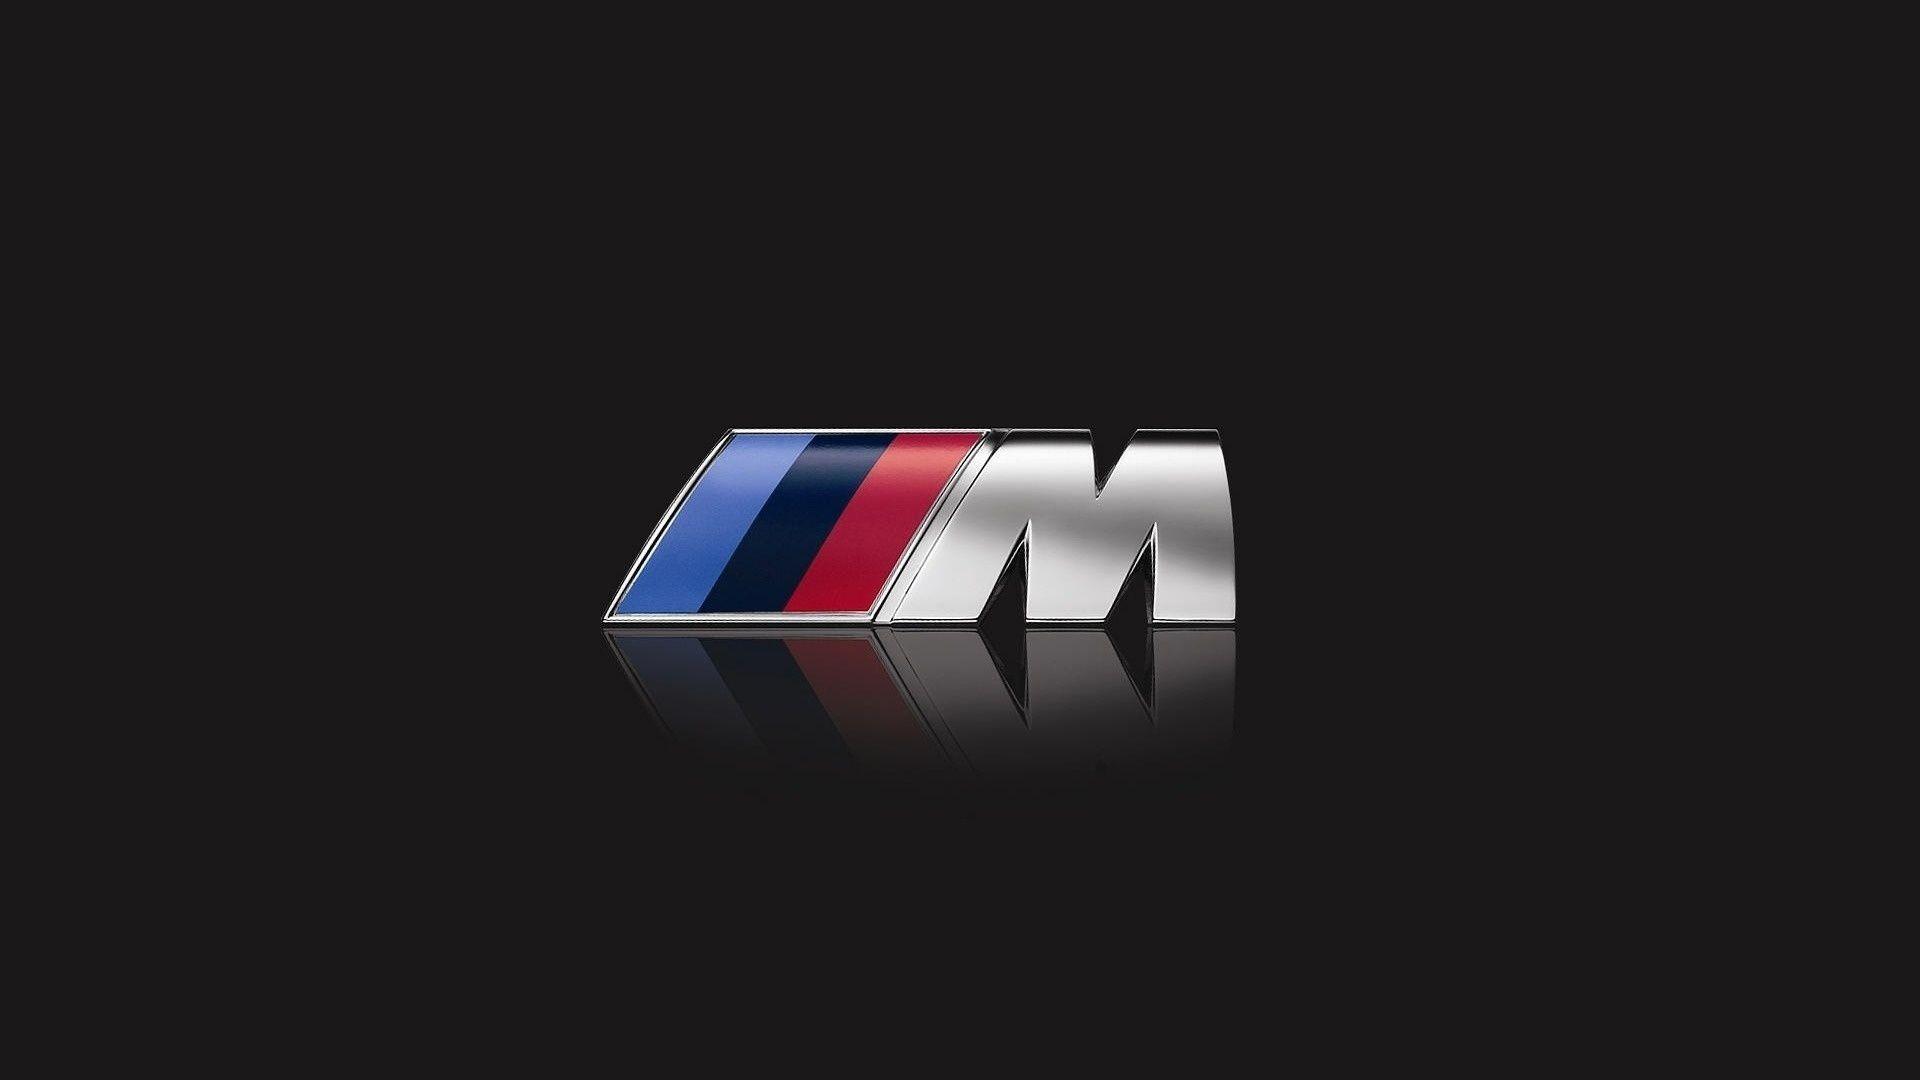 Bmw Logo M Series Black Wallpaper Hd Wide Coches Y Series